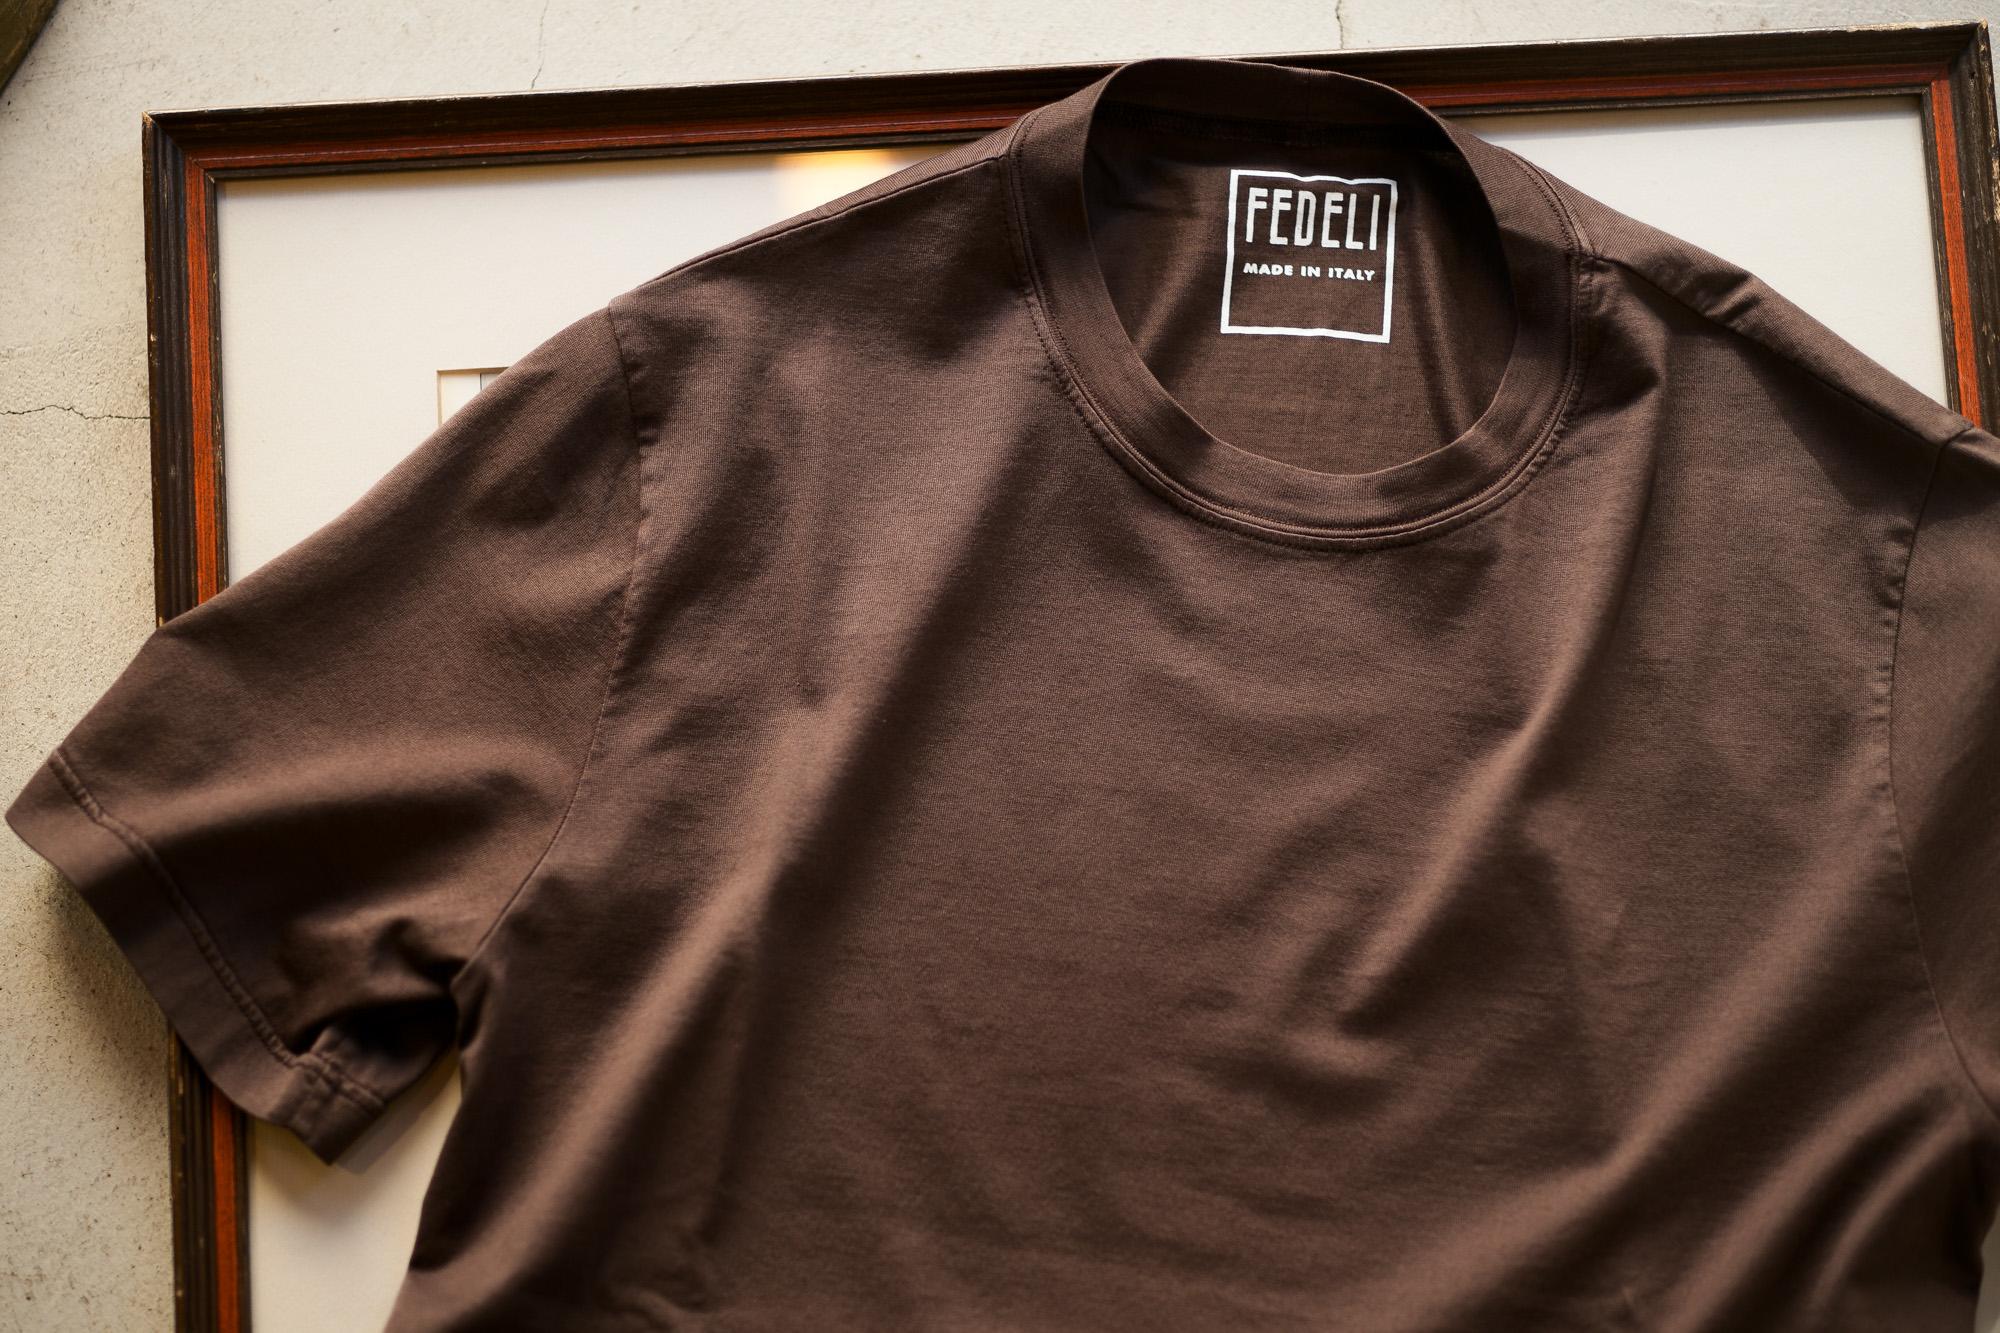 FEDELI(フェデーリ) Crew Neck T-shirt (クルーネック Tシャツ) ギザコットン Tシャツ BROWN (ブラウン・811) made in italy (イタリア製) 2020 春夏 【ご予約受付中】愛知 名古屋 altoediritto アルトエデリット TEE